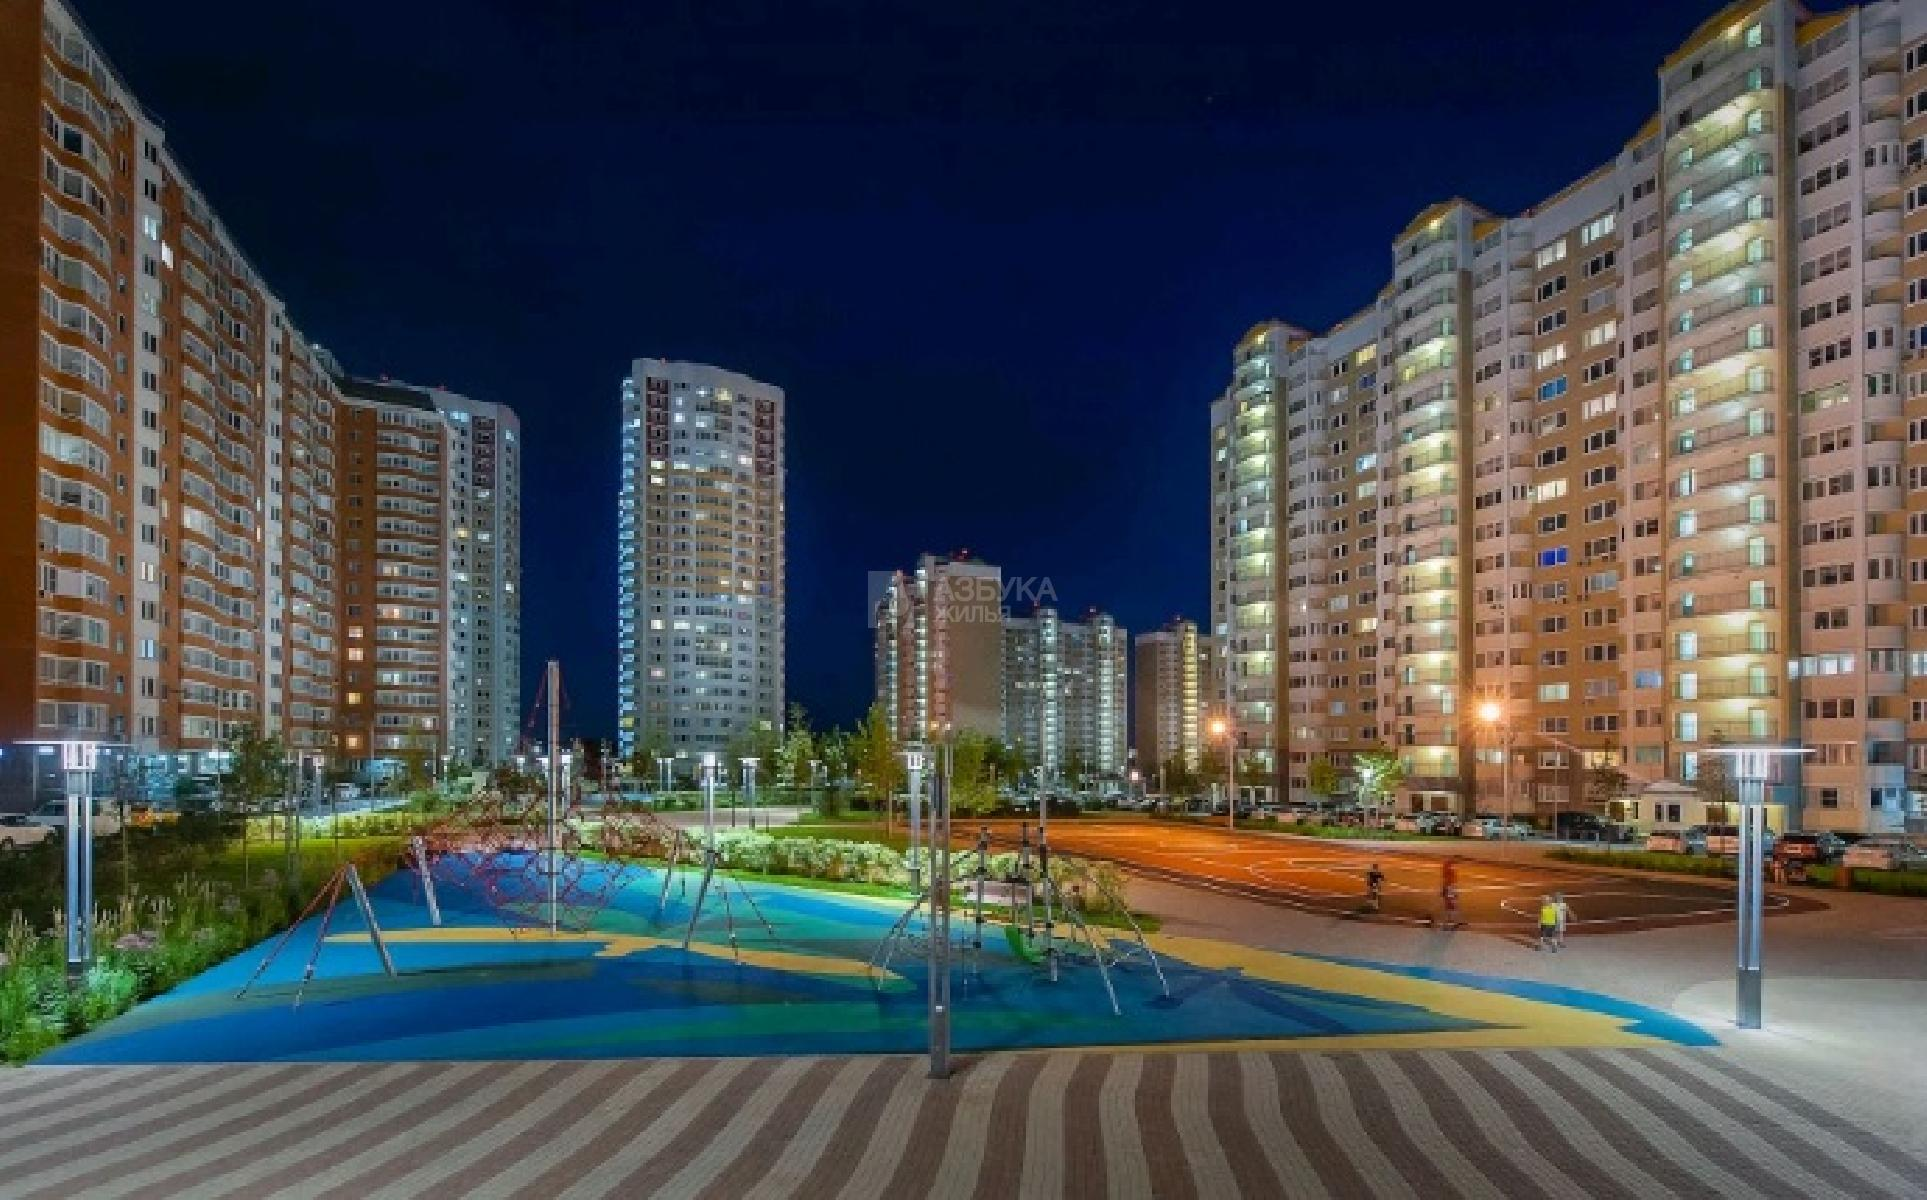 Фото №5 - 1-комнатная квартира, Москва, город Московский, Никитина улица 11 корпус 5, метро Филатов луг